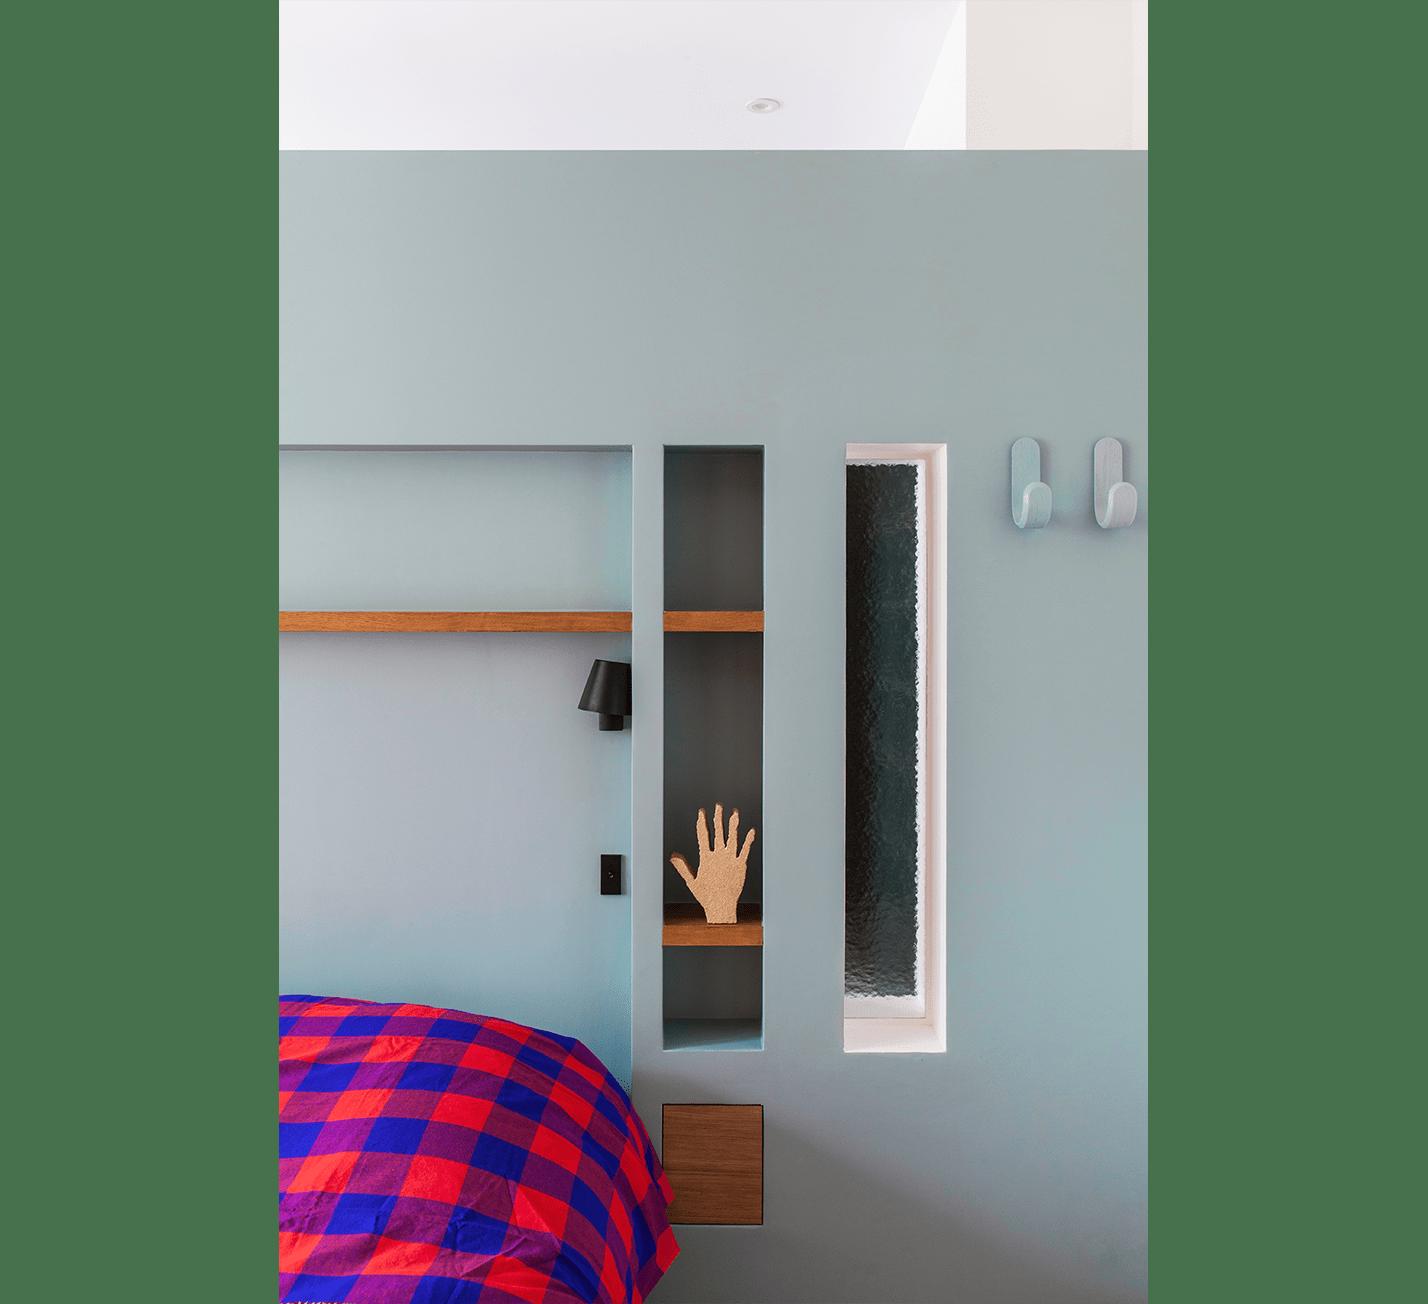 Projet-Arlequin-Atelier-Steve-Pauline-Borgia-Architecture-interieur-16-min